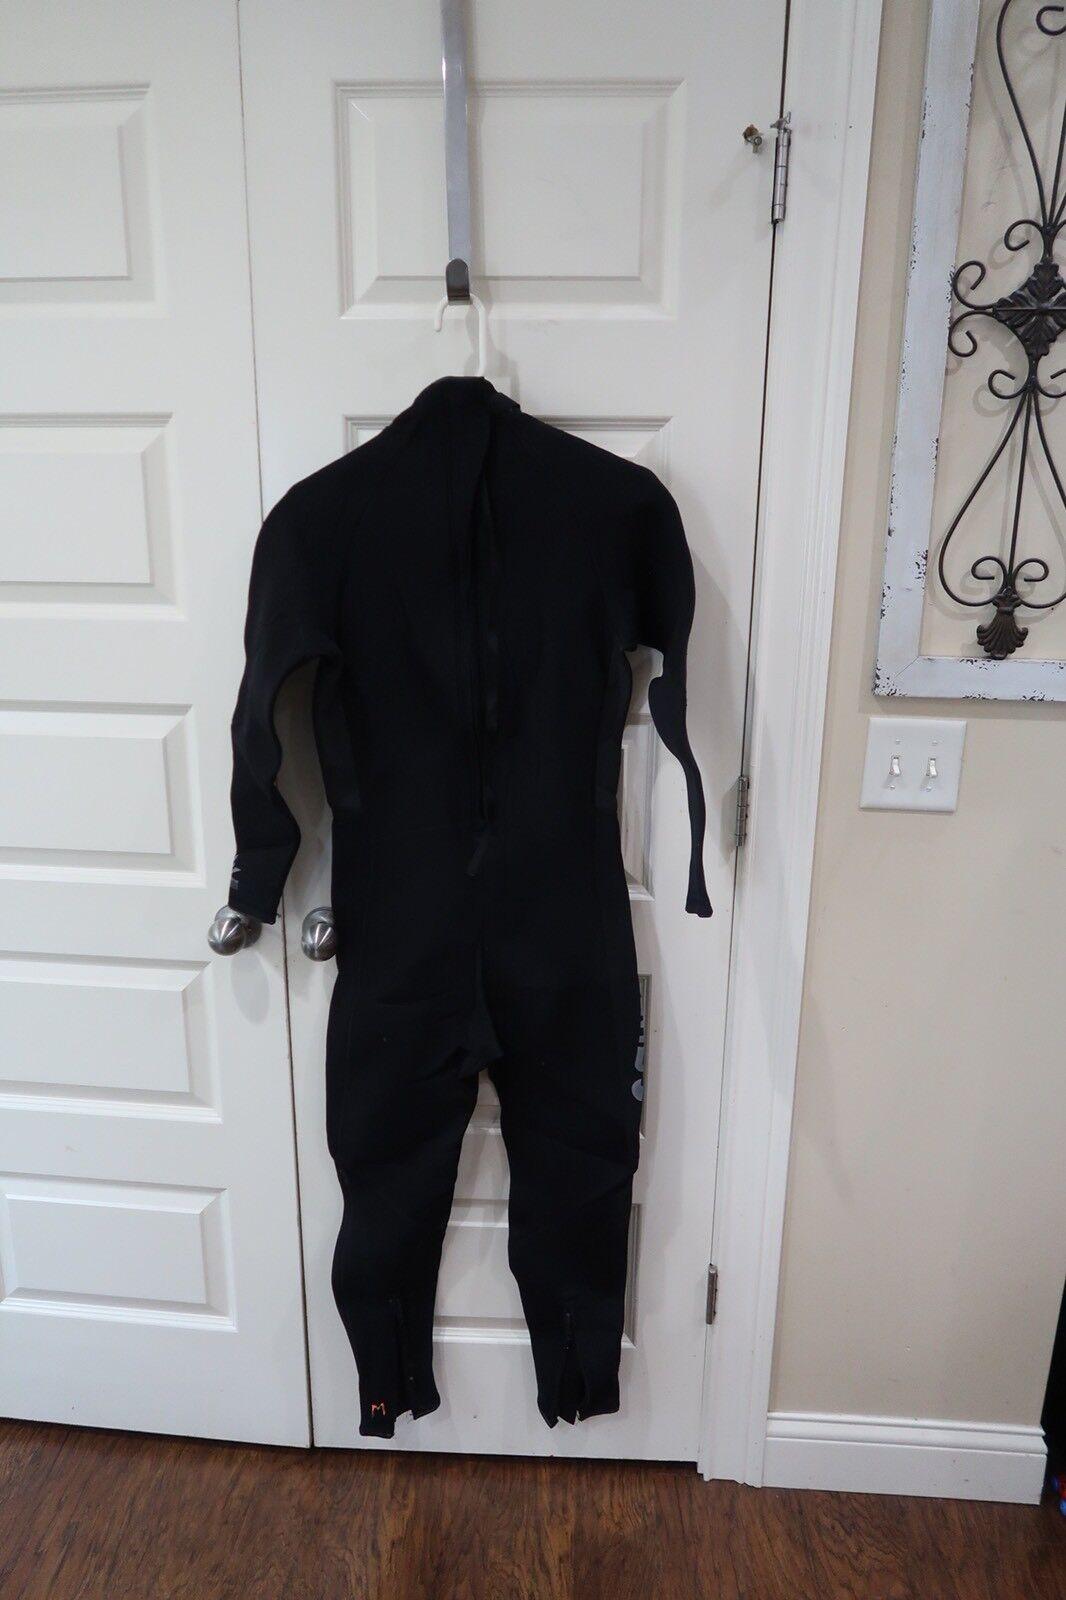 Dark  Star Mens Full Wetsuit Size Medium 3 2 Sherwood Scuba Dive  shop clearance